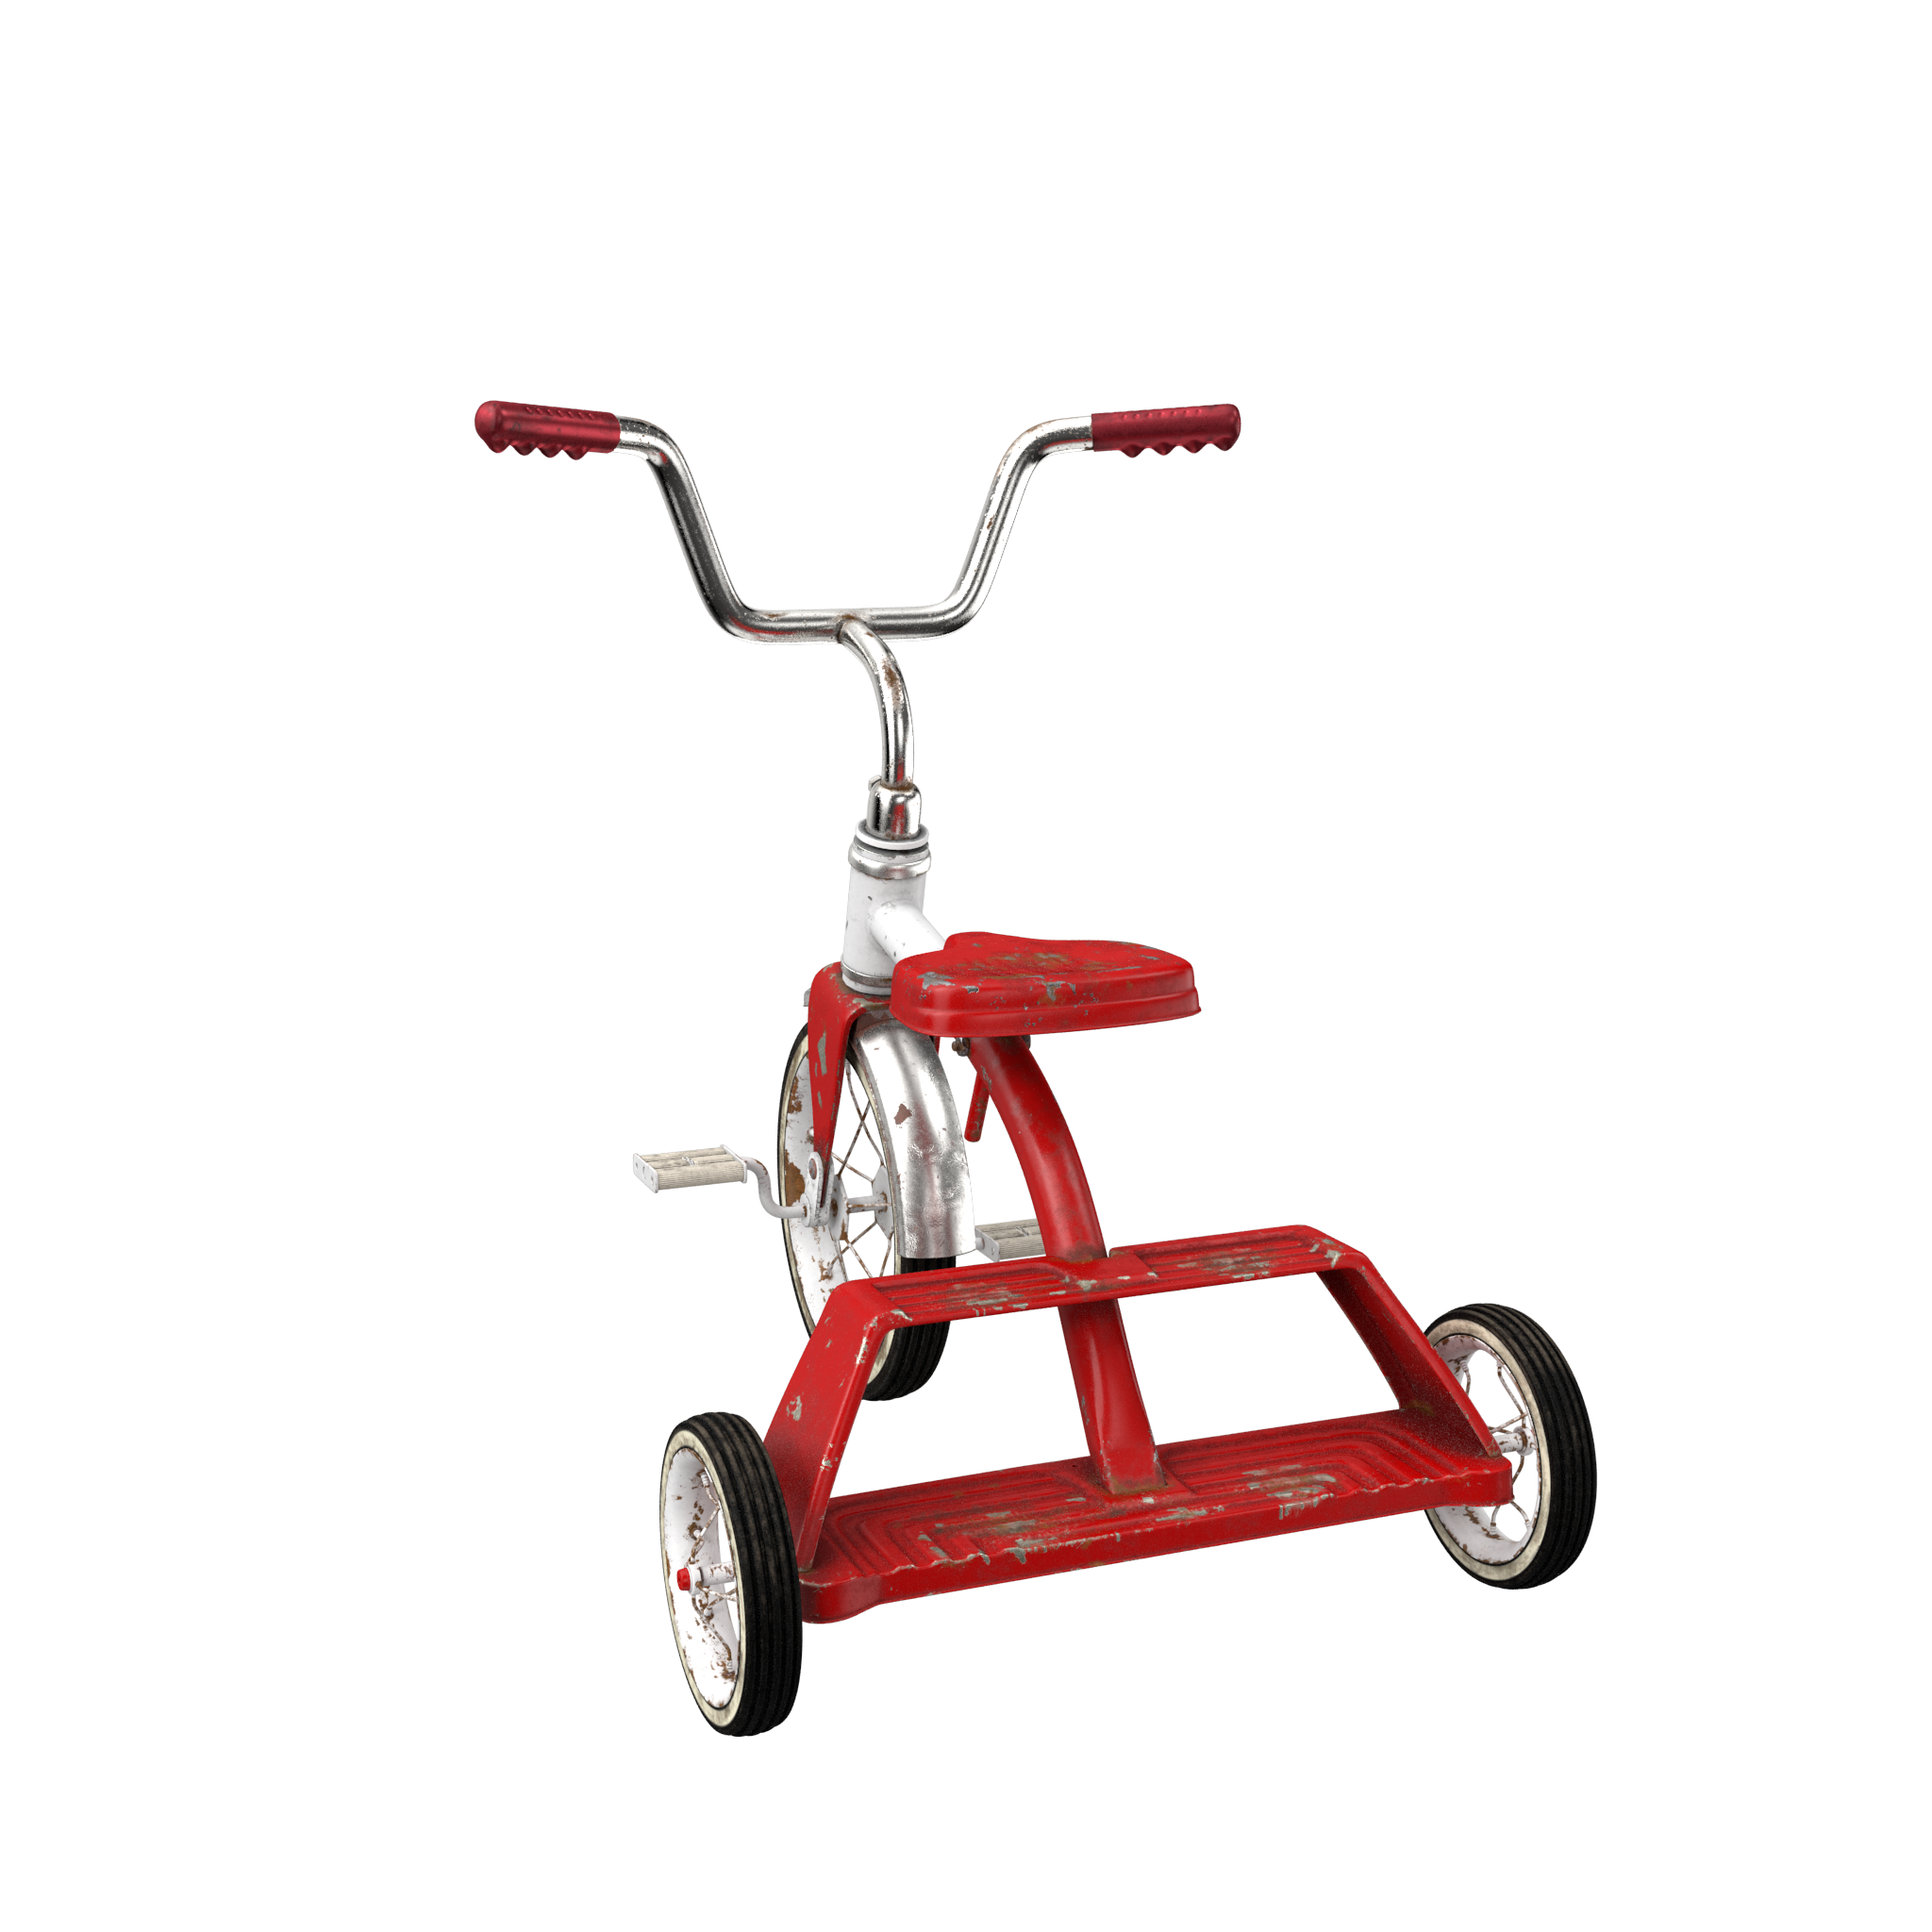 Dirty Vintage Tricycle PNG Image